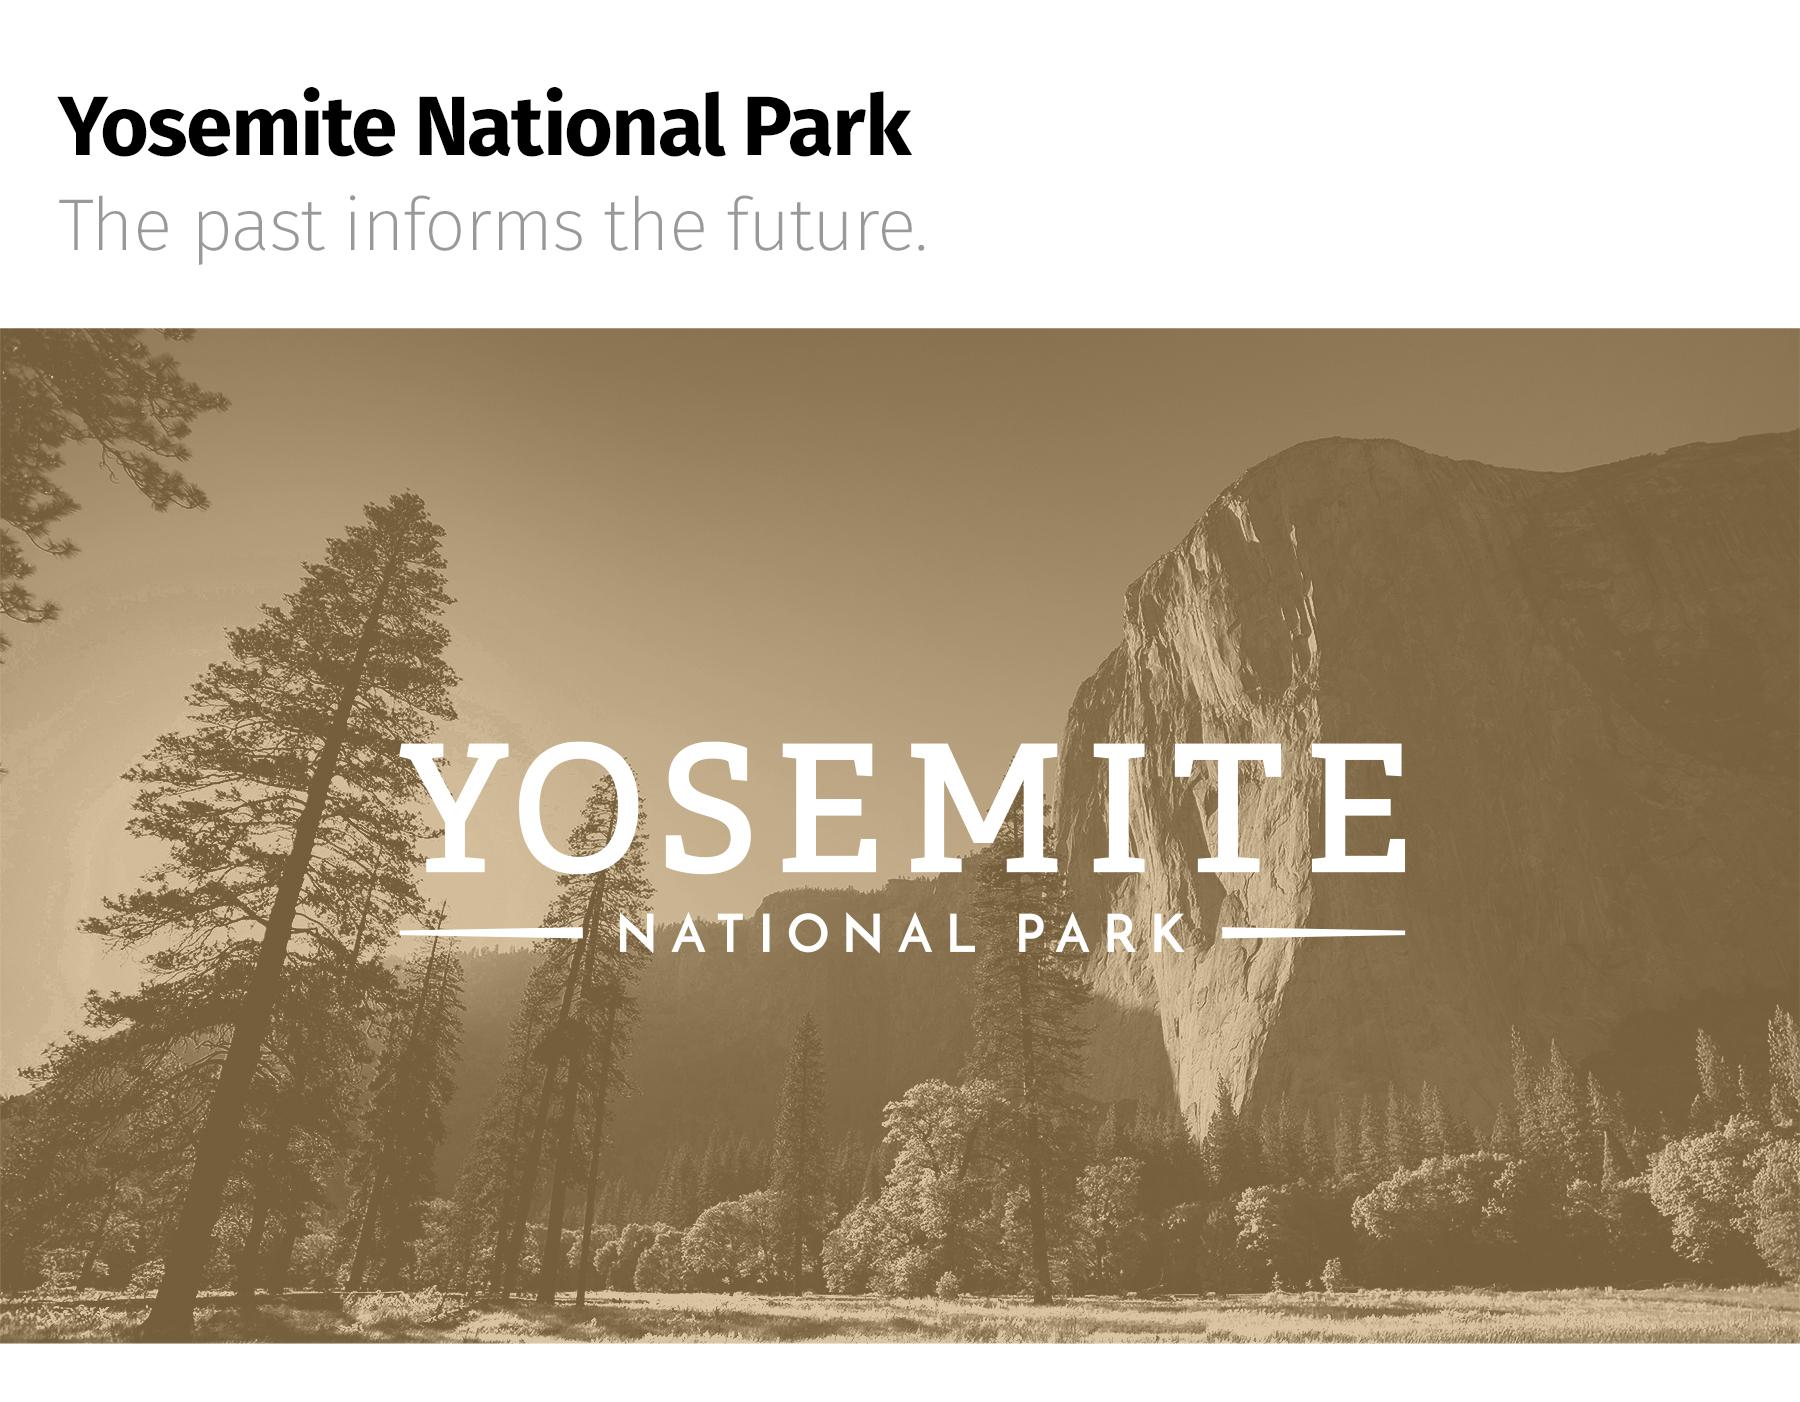 YosemiteCaseStudy_01-2